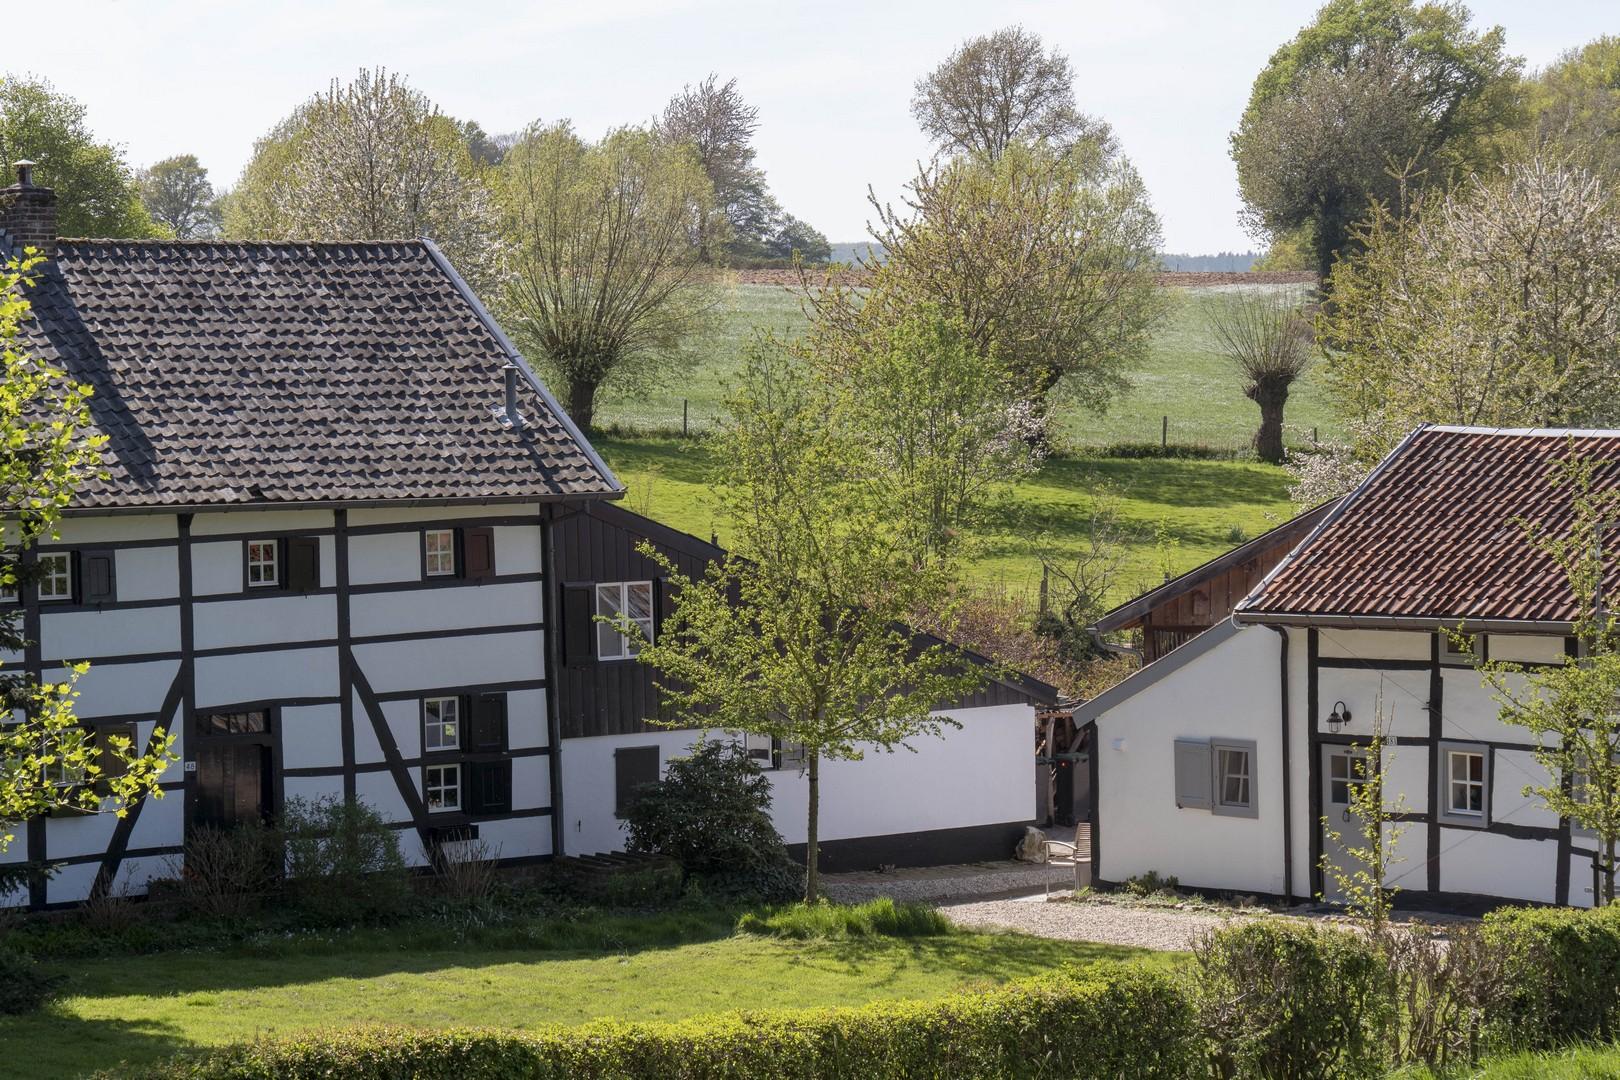 Zuid-Limburg Zuid-Limburg